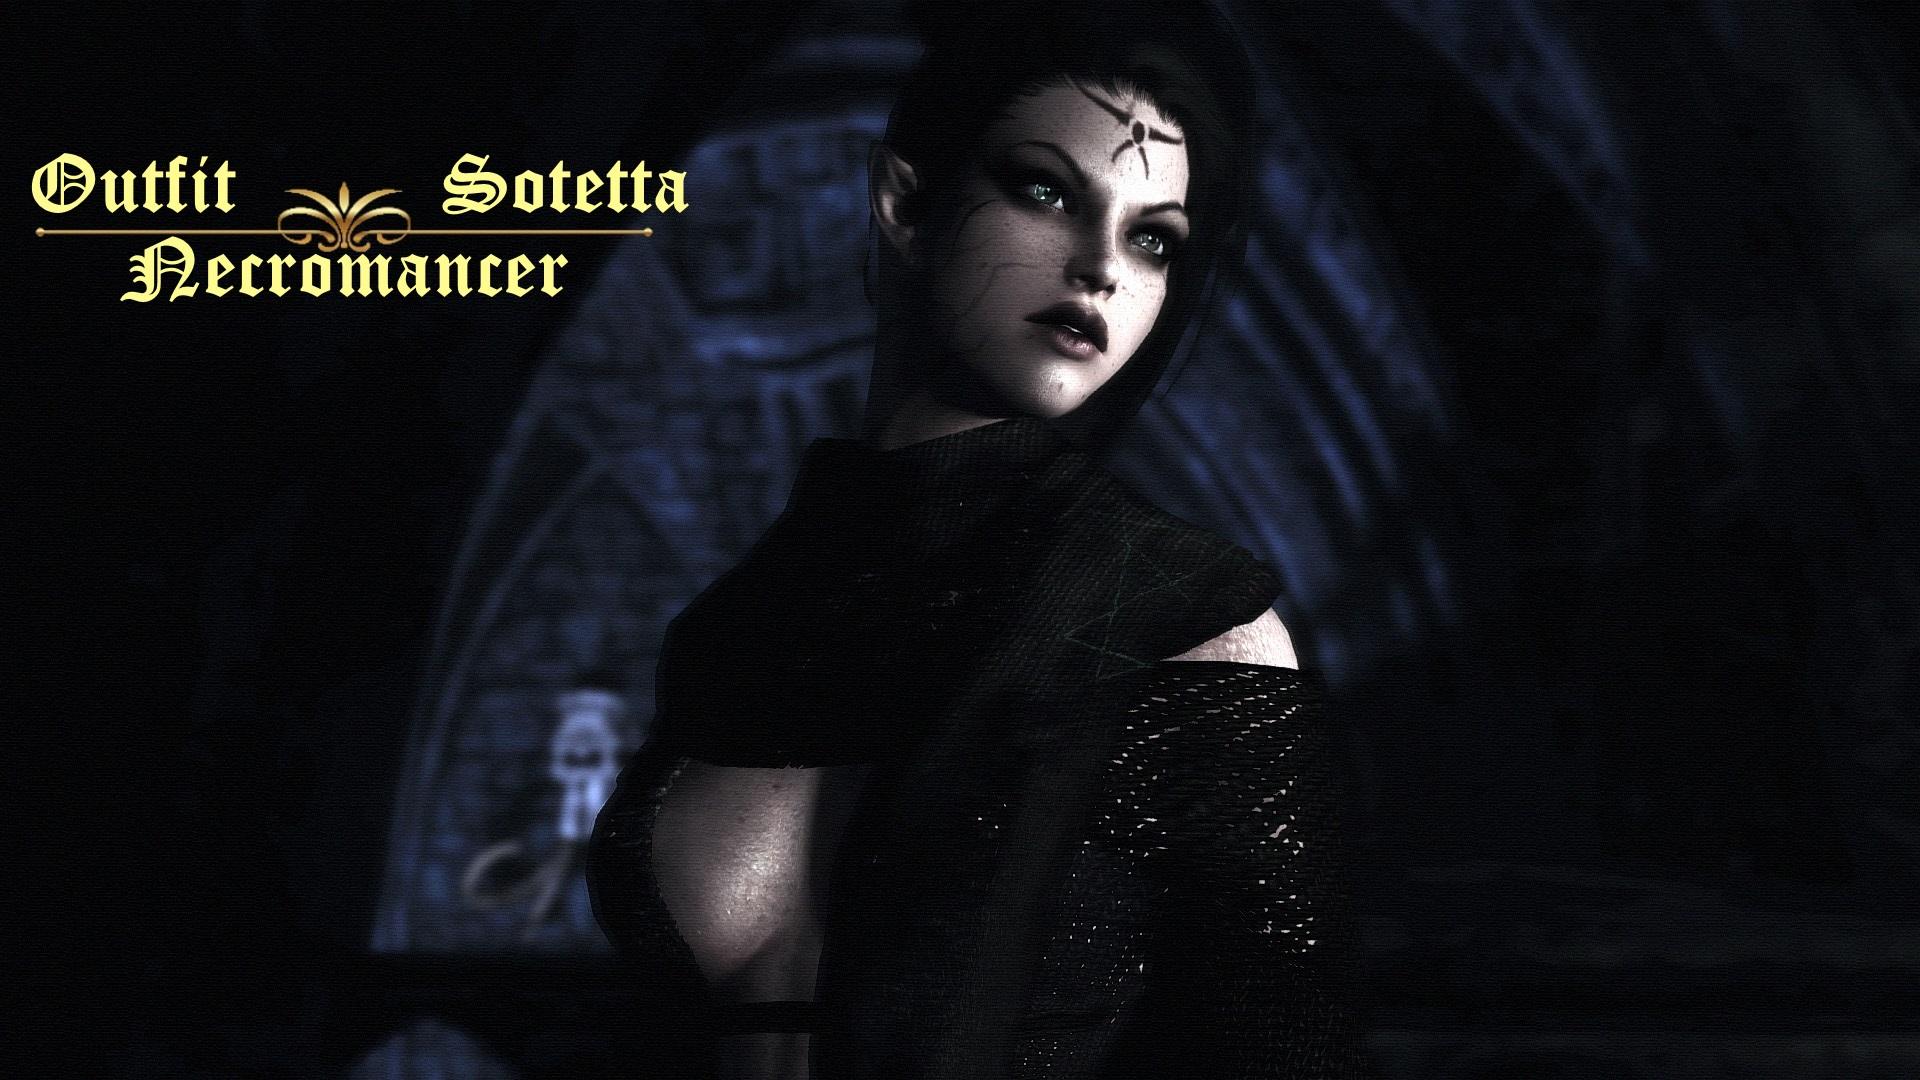 Sotteta_Necromancer_Outfit_L.jpg